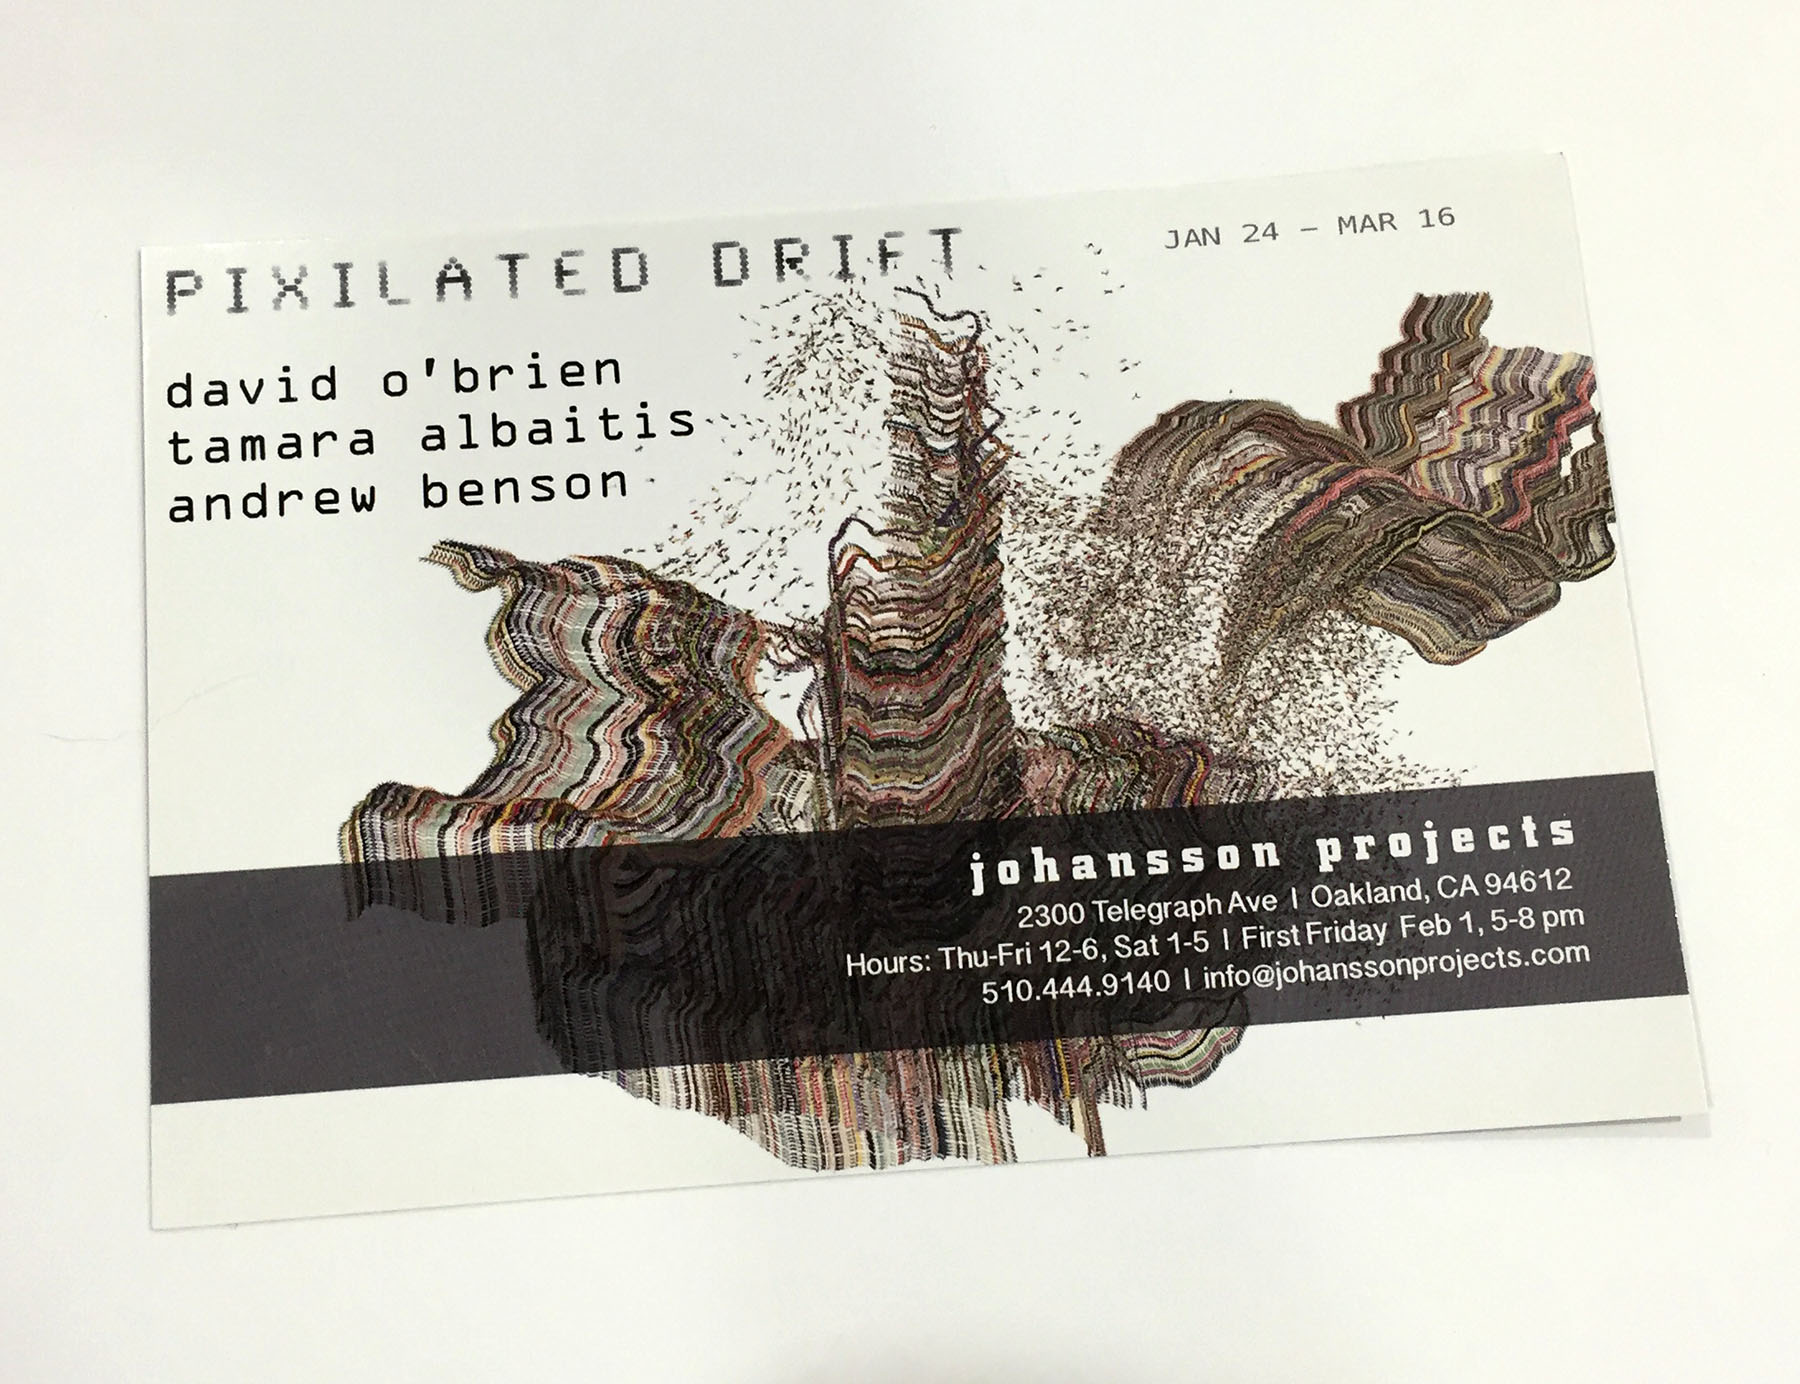 David_OBrien_johansson_projects_pixilated_drift.jpg